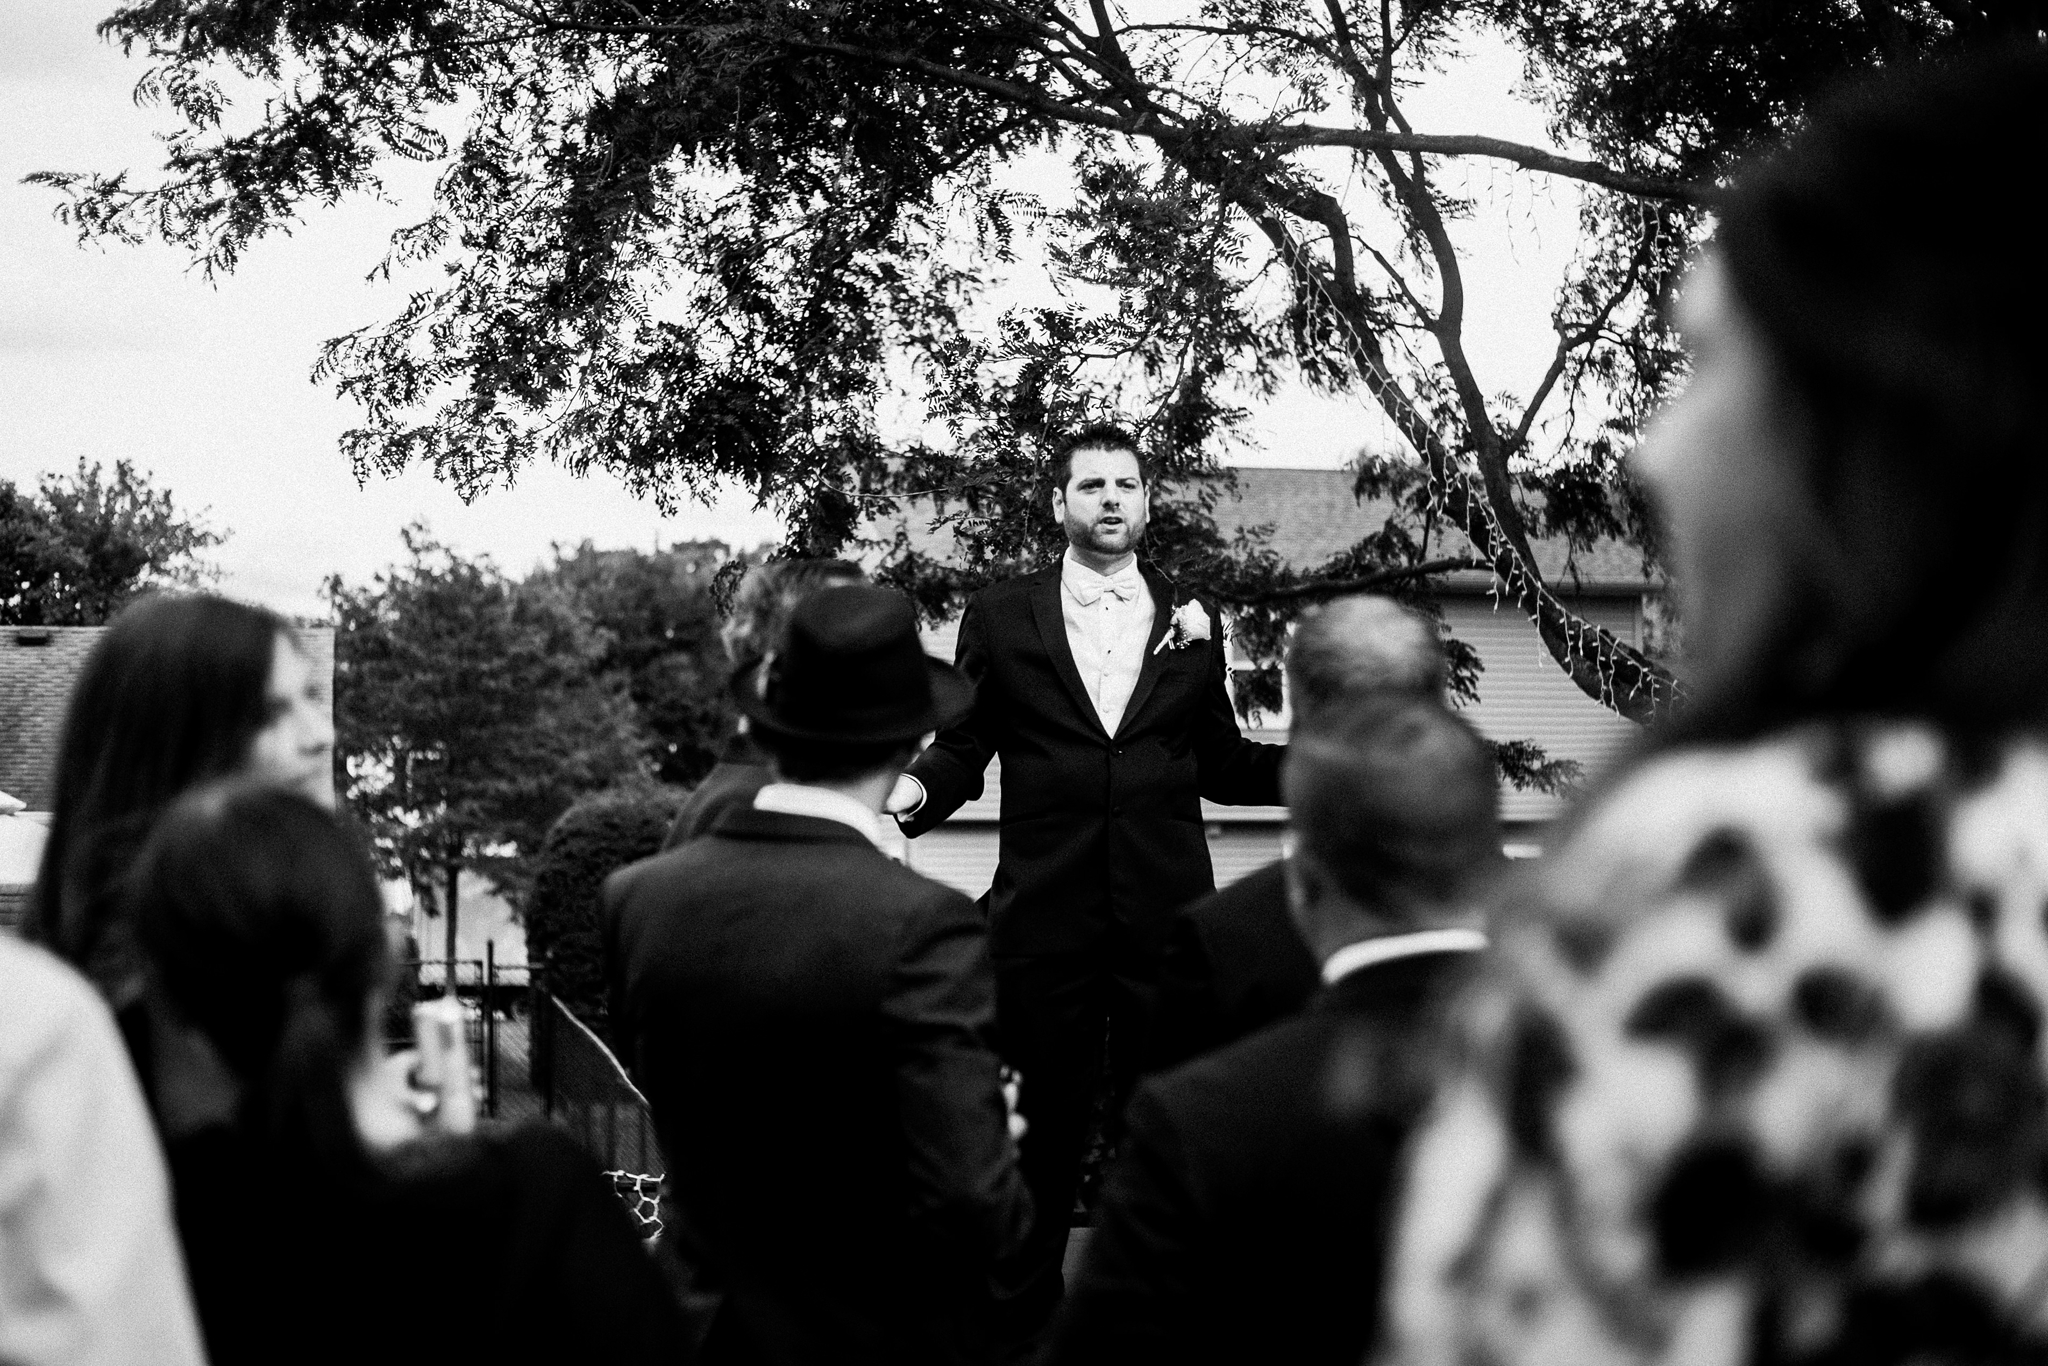 algonquin_IL_wedding_photograper_0003.jpg